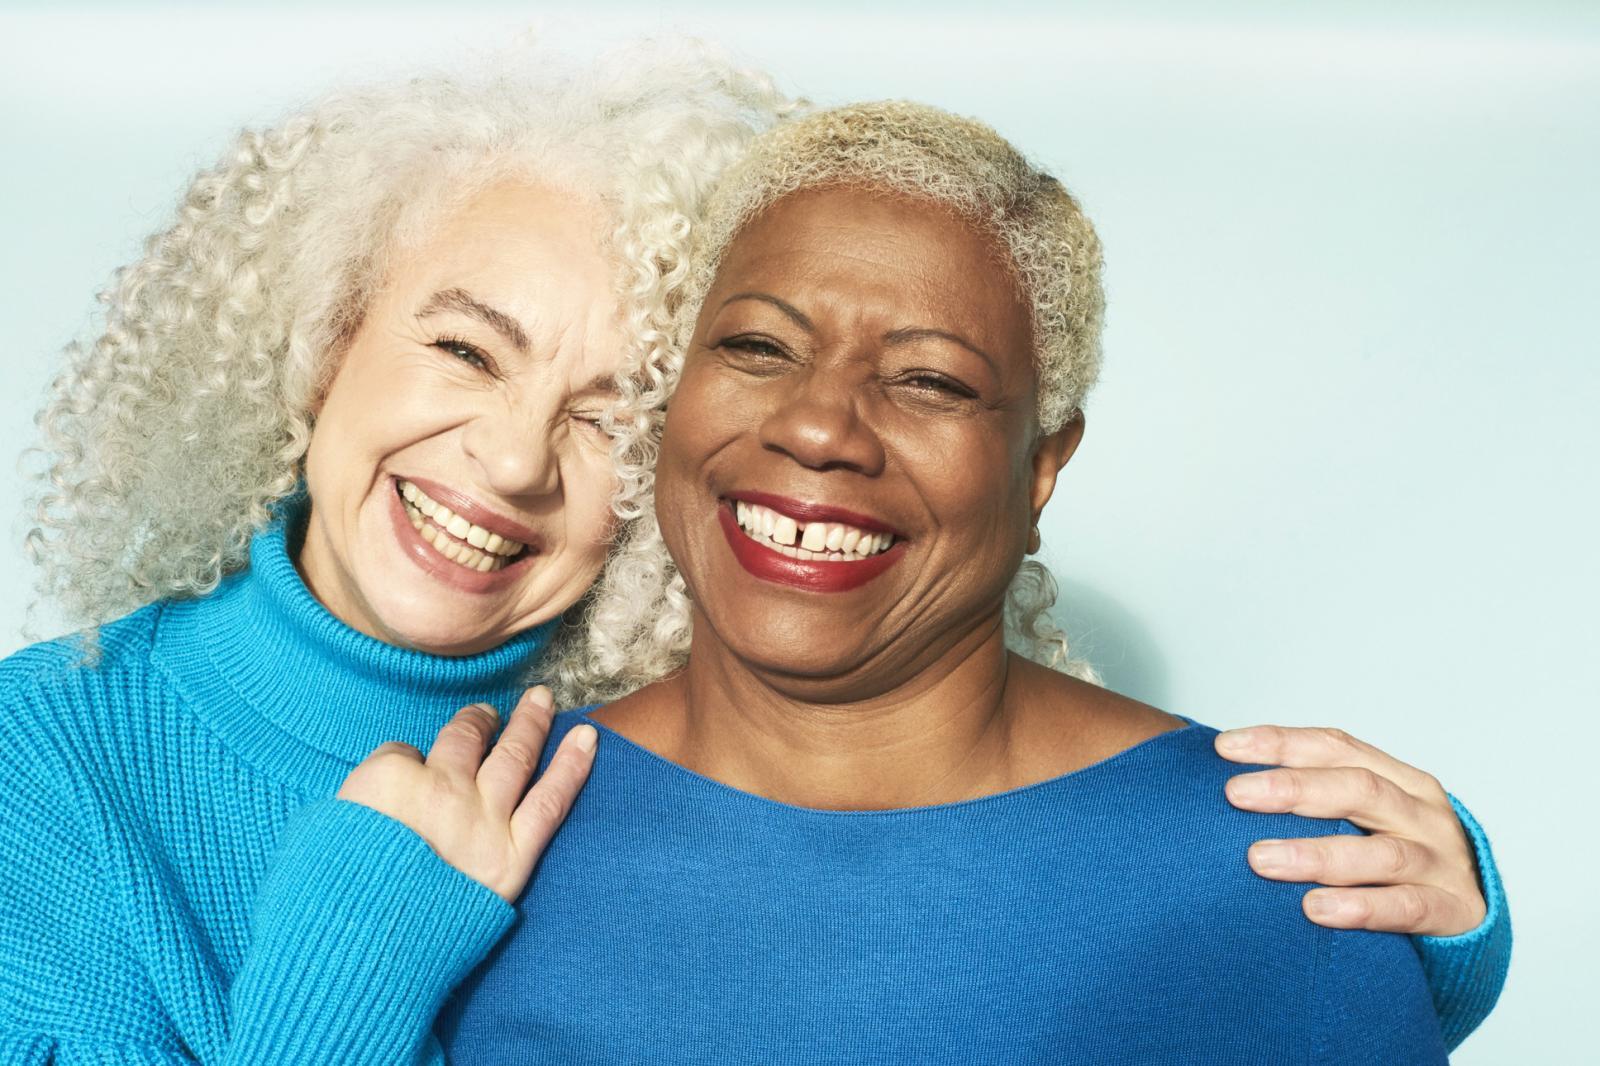 Two Senior Women Smiling